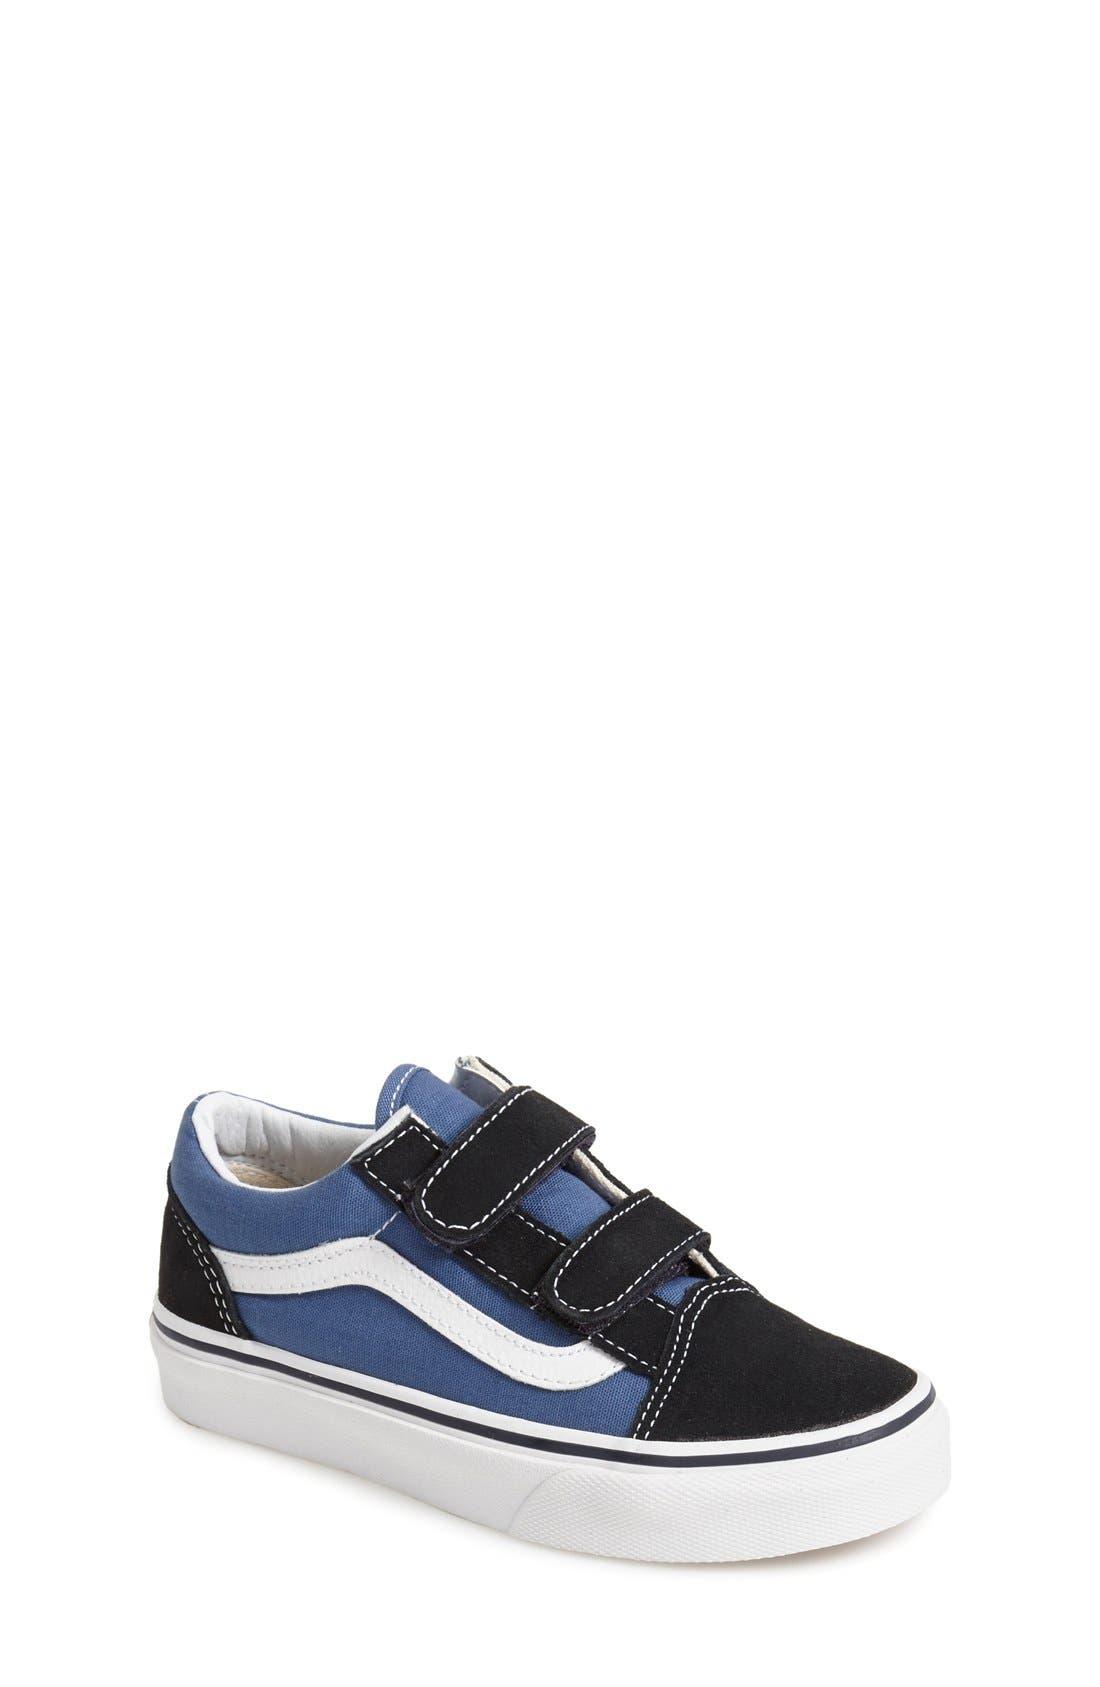 Main Image - Vans 'Old Skool V' Sneaker (Toddler, Little Kid & Big Kid)